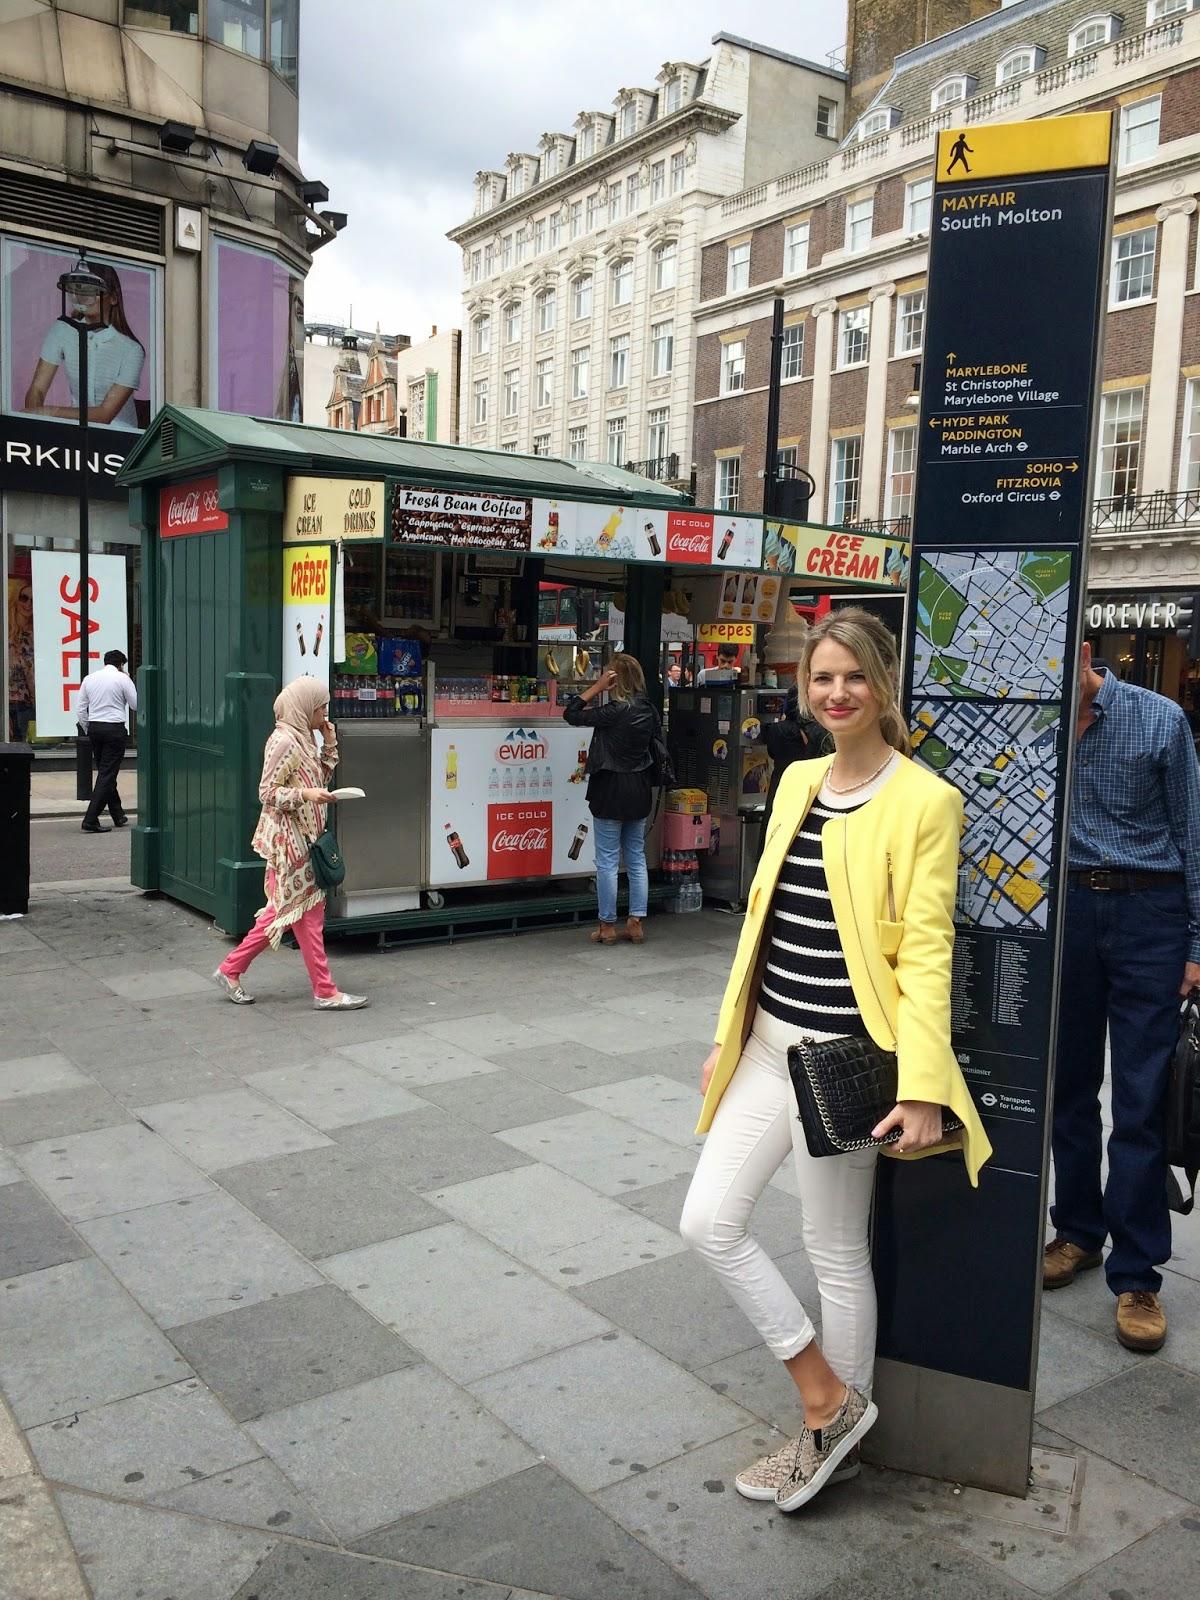 London, striped jumper, nautical outfit, nautical themed outfit, nautical coloured outfit, breton stipes, slip ons, hm slipons, london, london street style